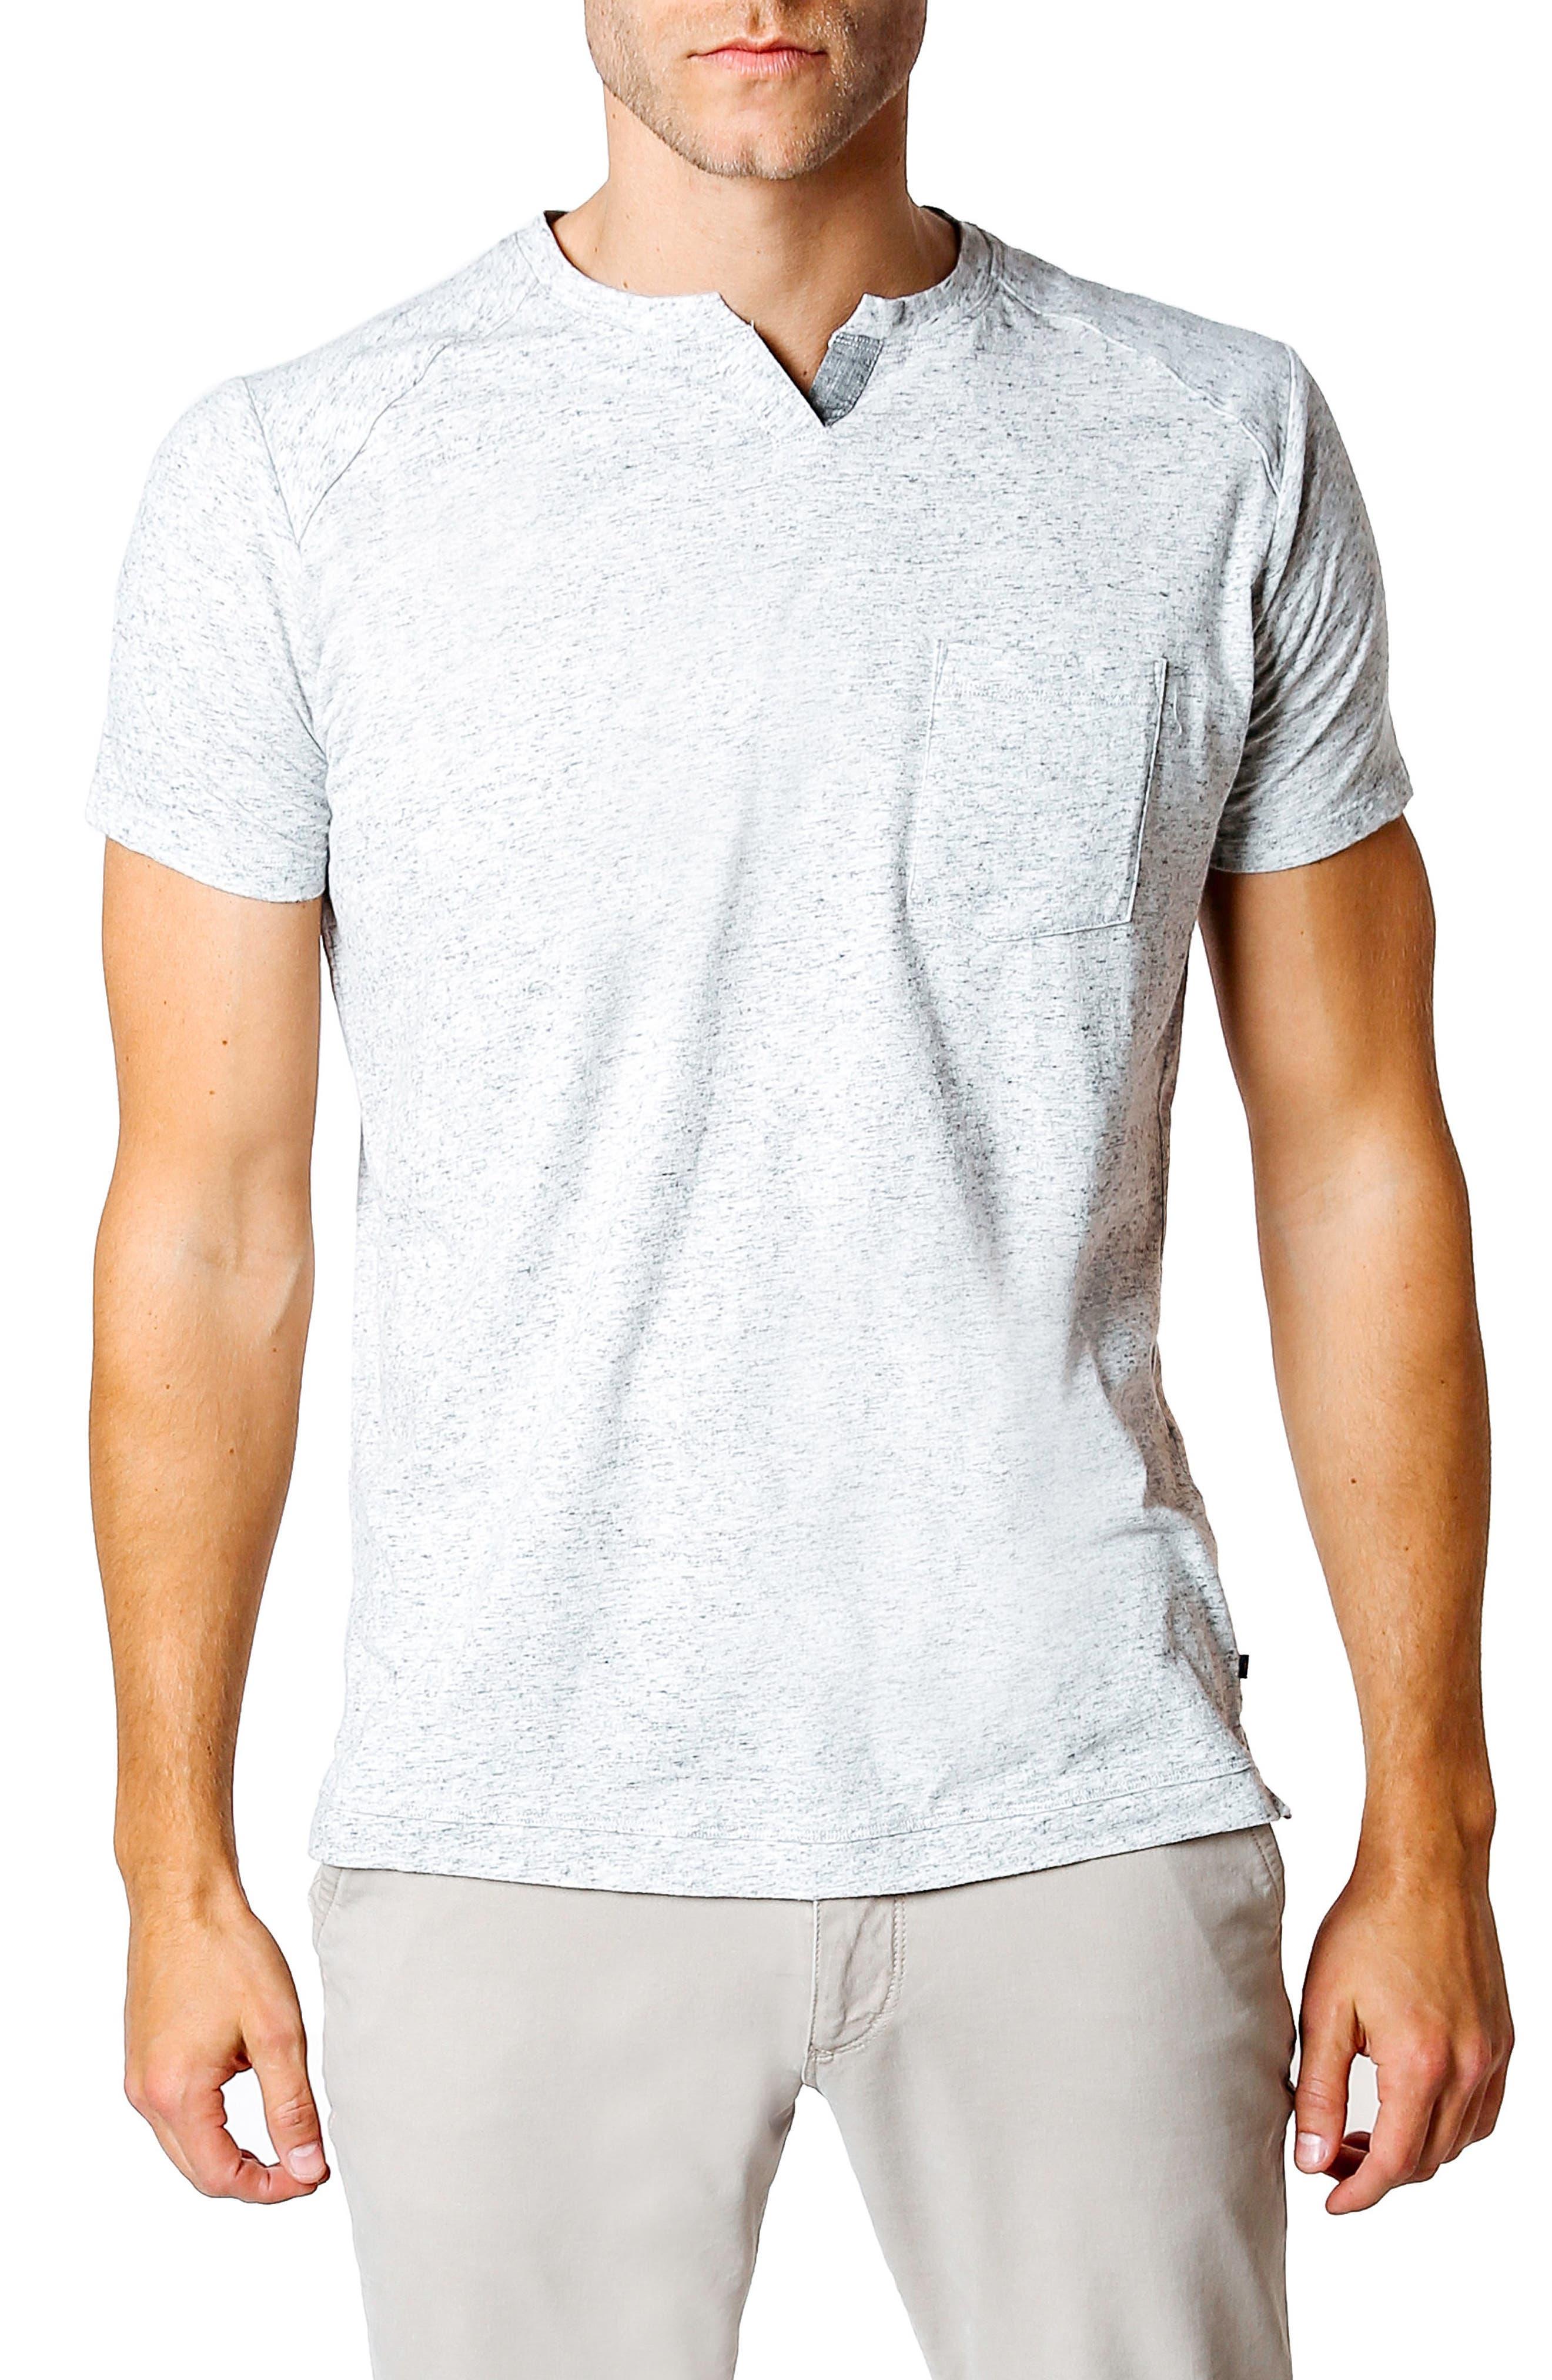 Slim Fit T-Shirt,                         Main,                         color, GREY HEATHER